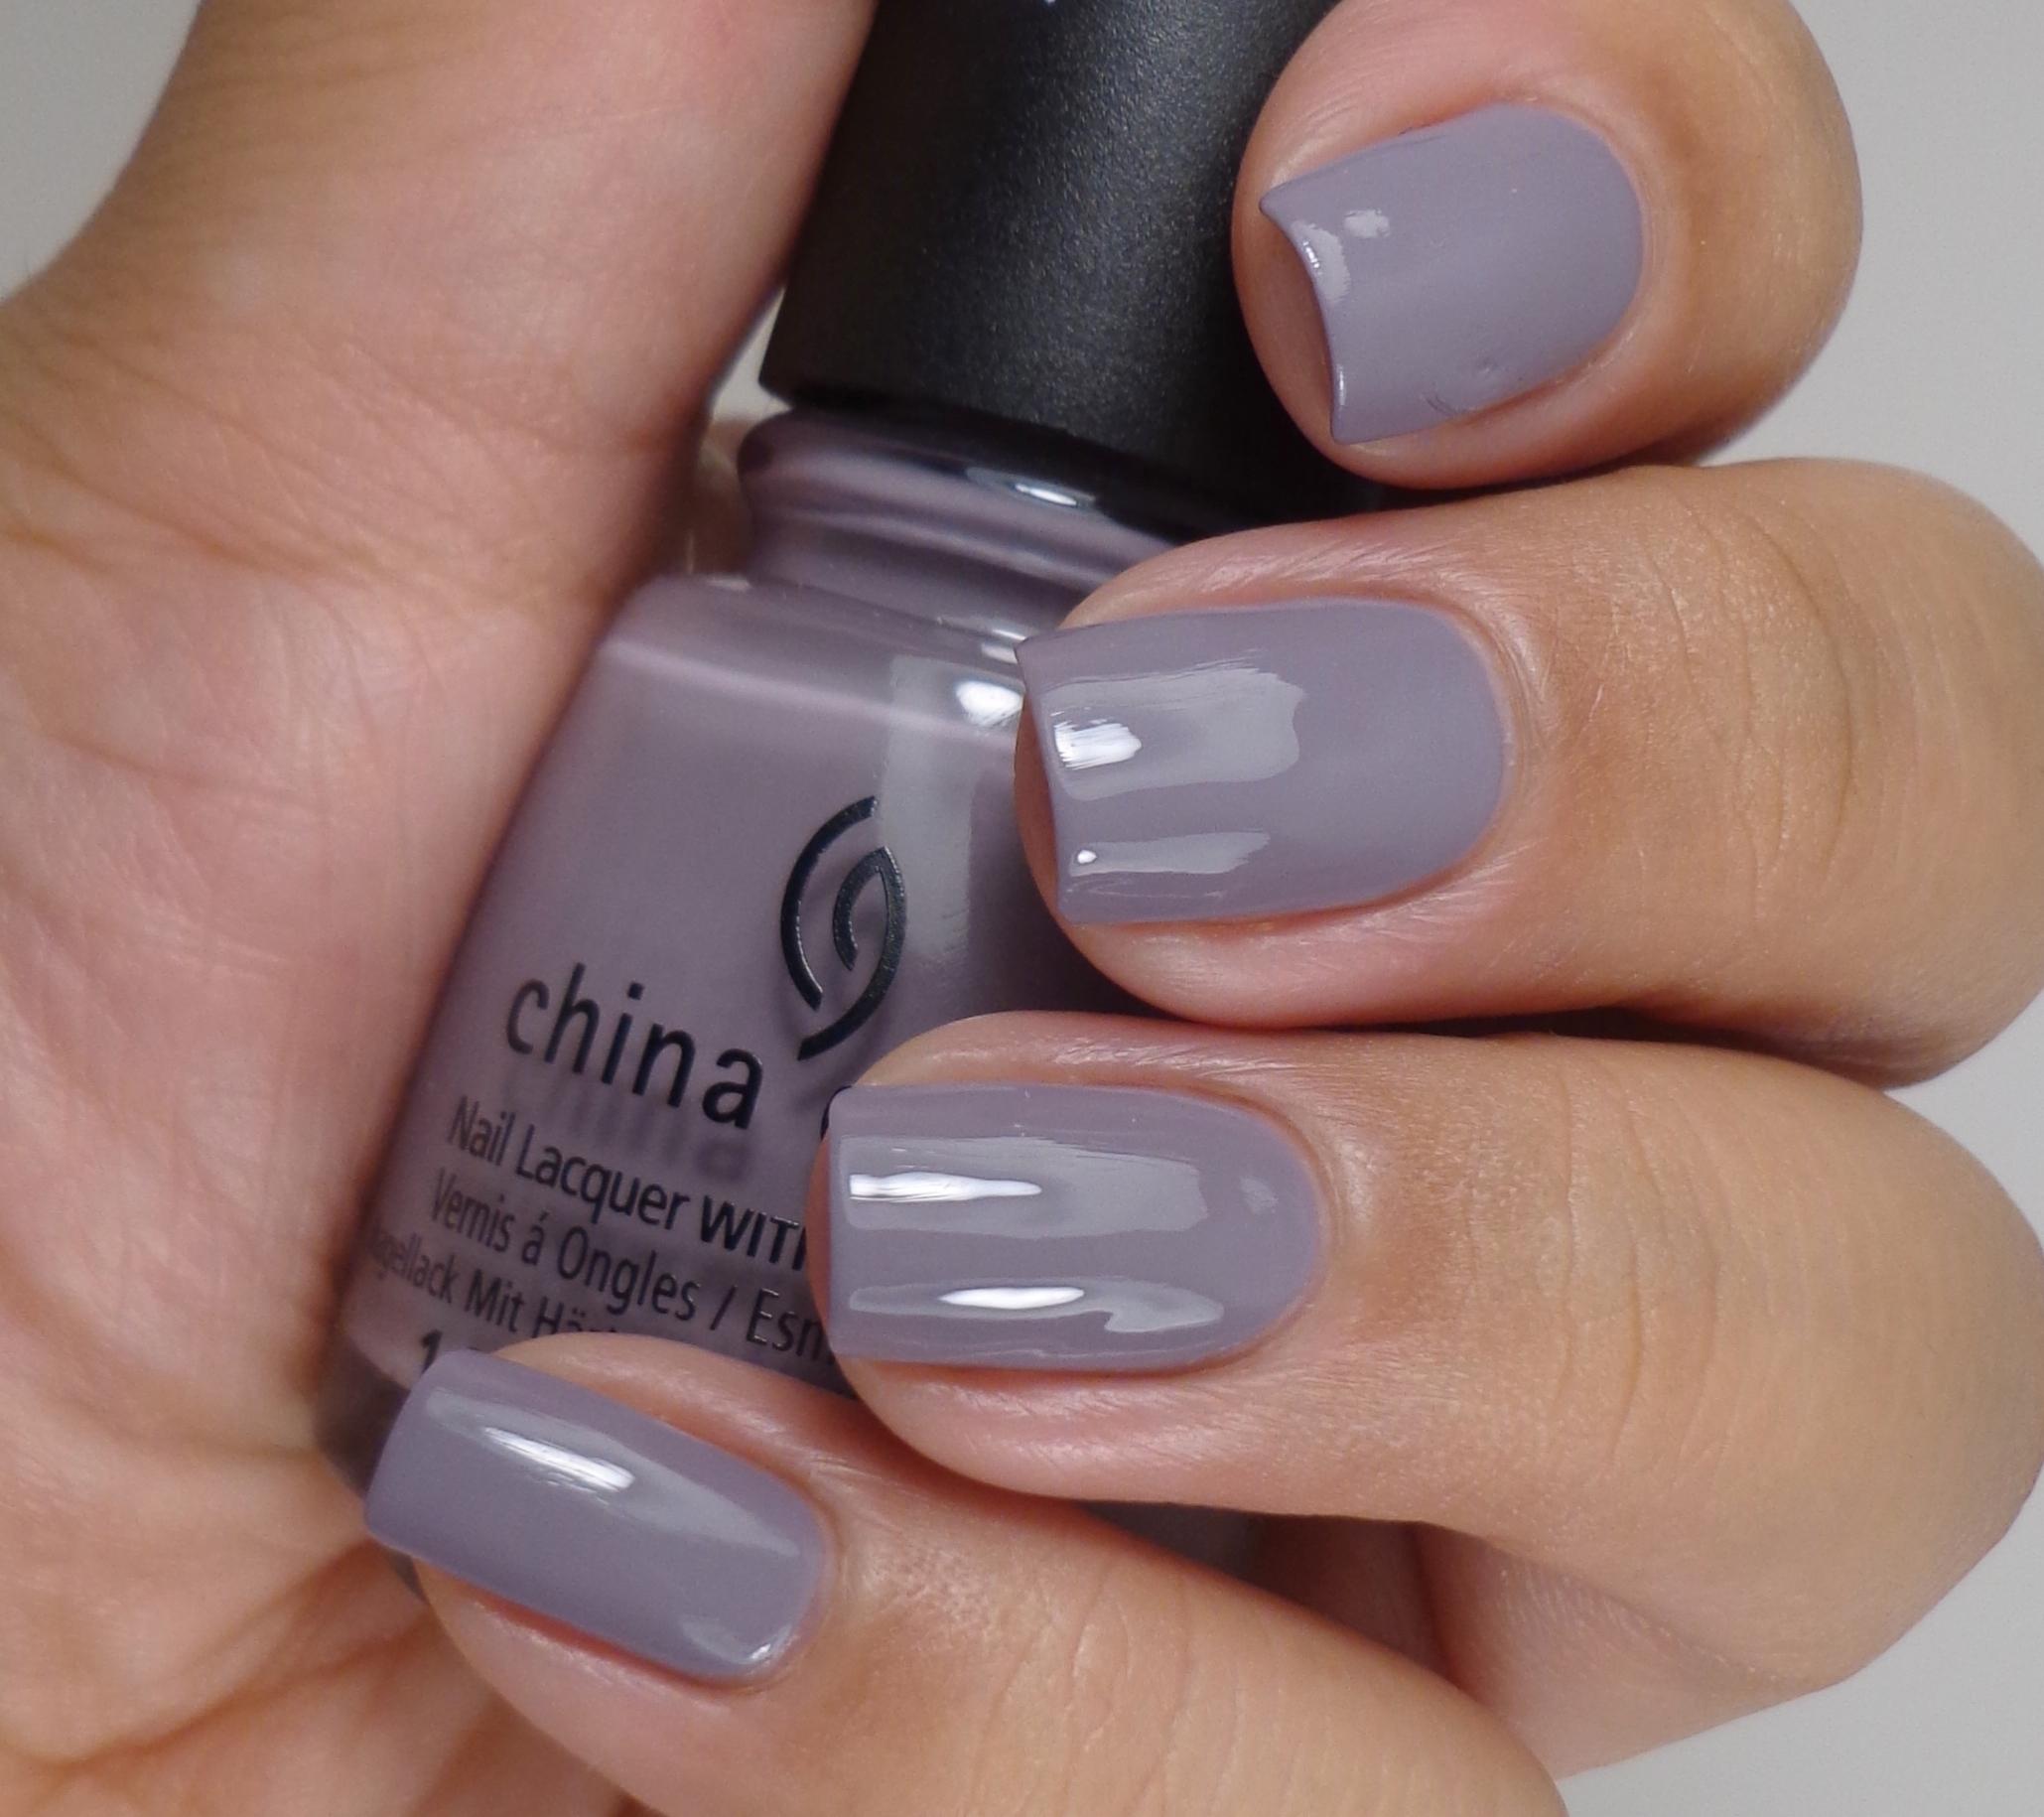 China Glaze Release 2